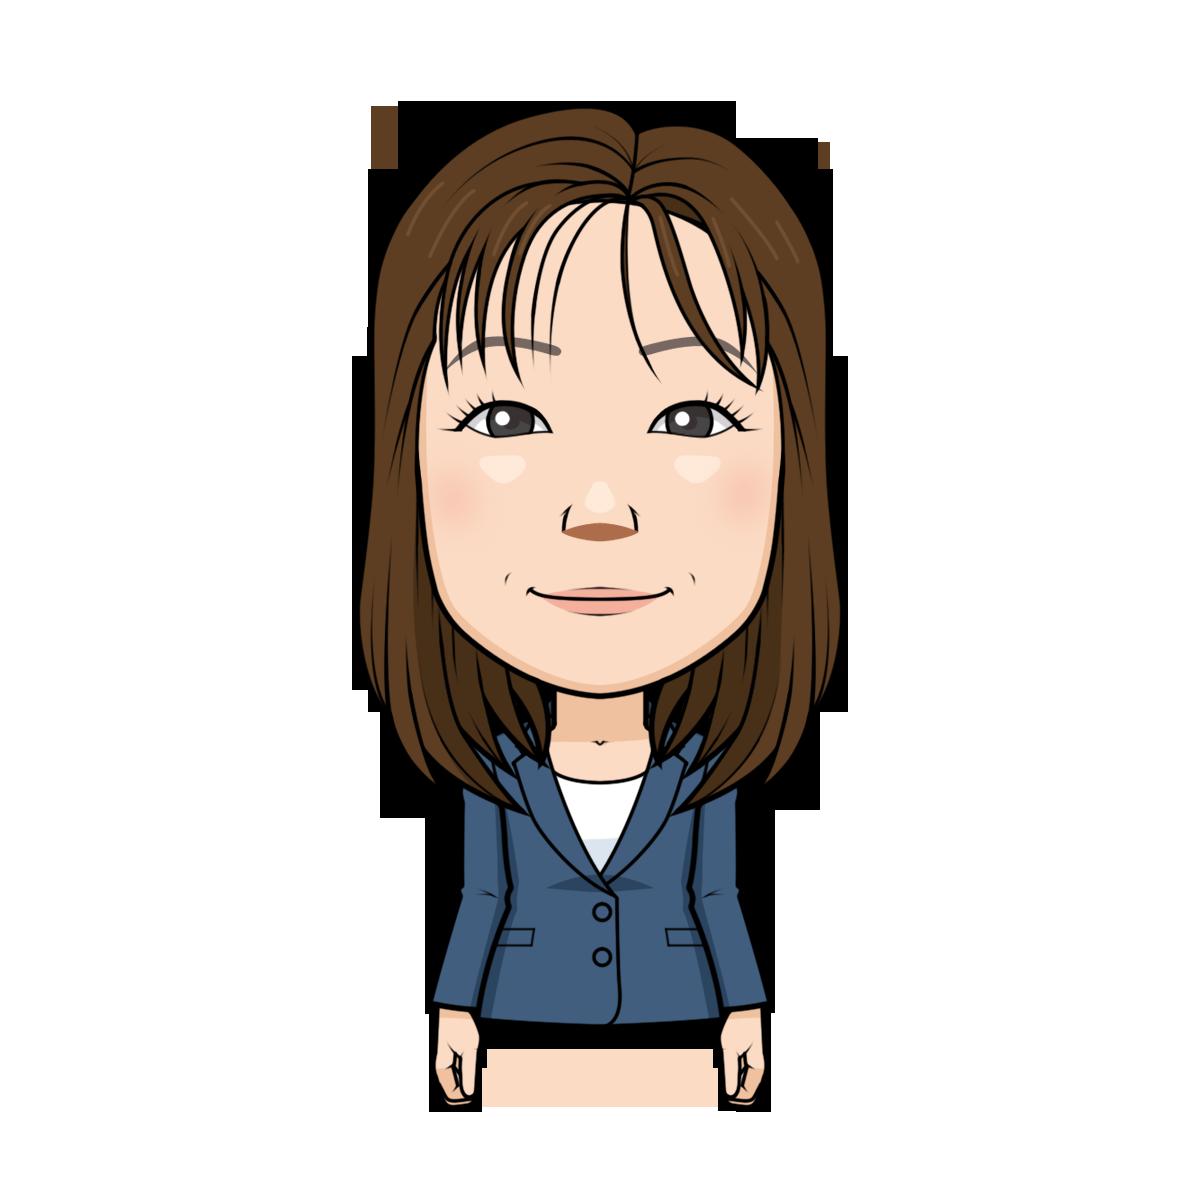 隅谷 至子(Sumitani Noriko)